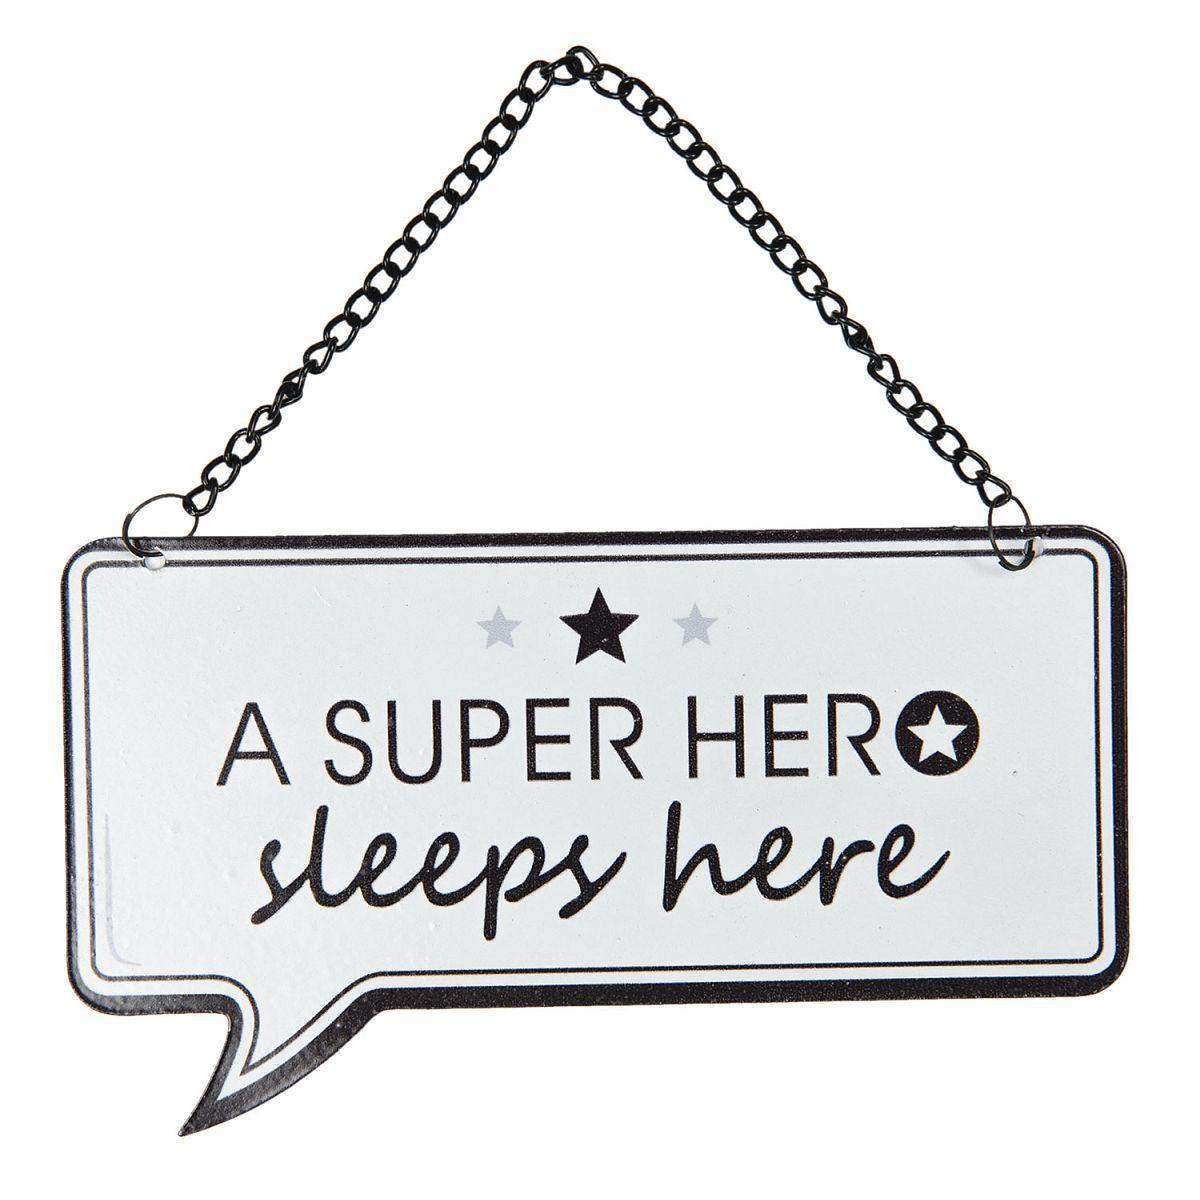 Závěsná plechová cedulka SUPER HERO